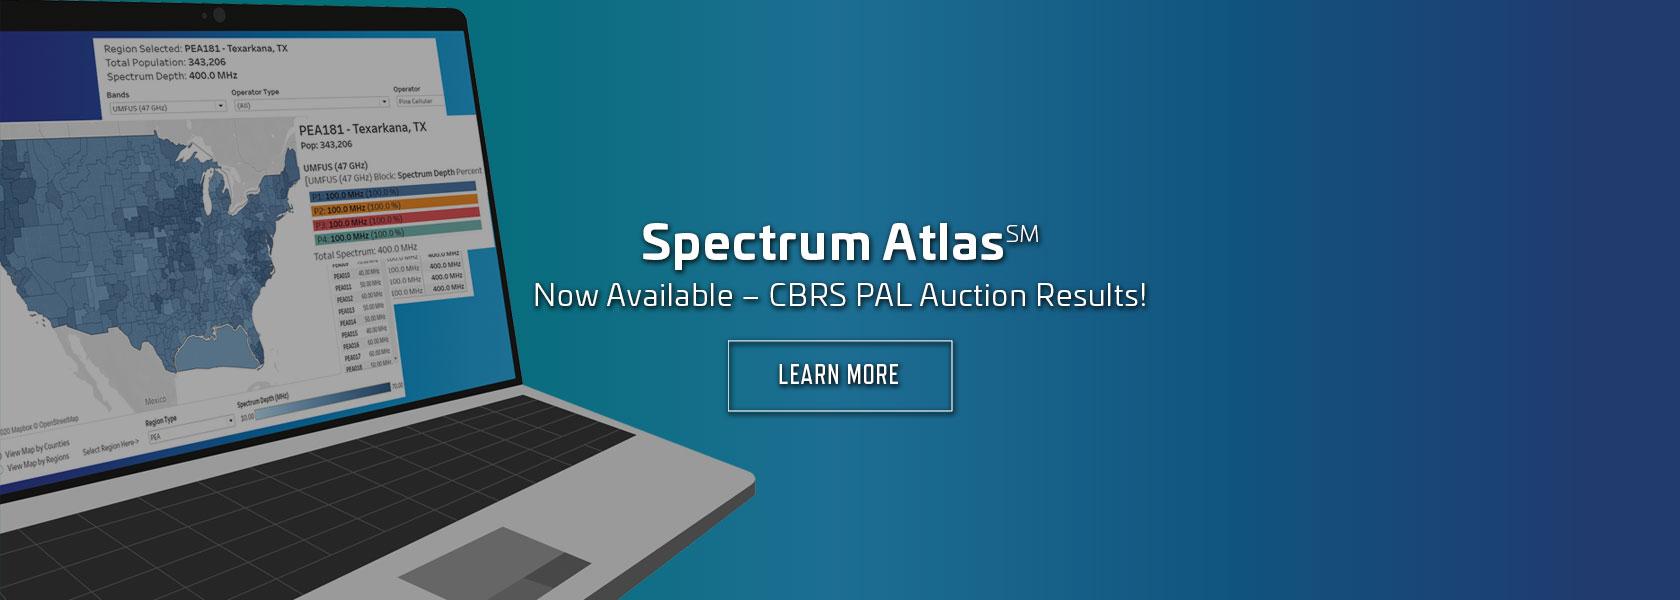 Spectrum Atlas - CBRS PAL Auction Results—Now Available!